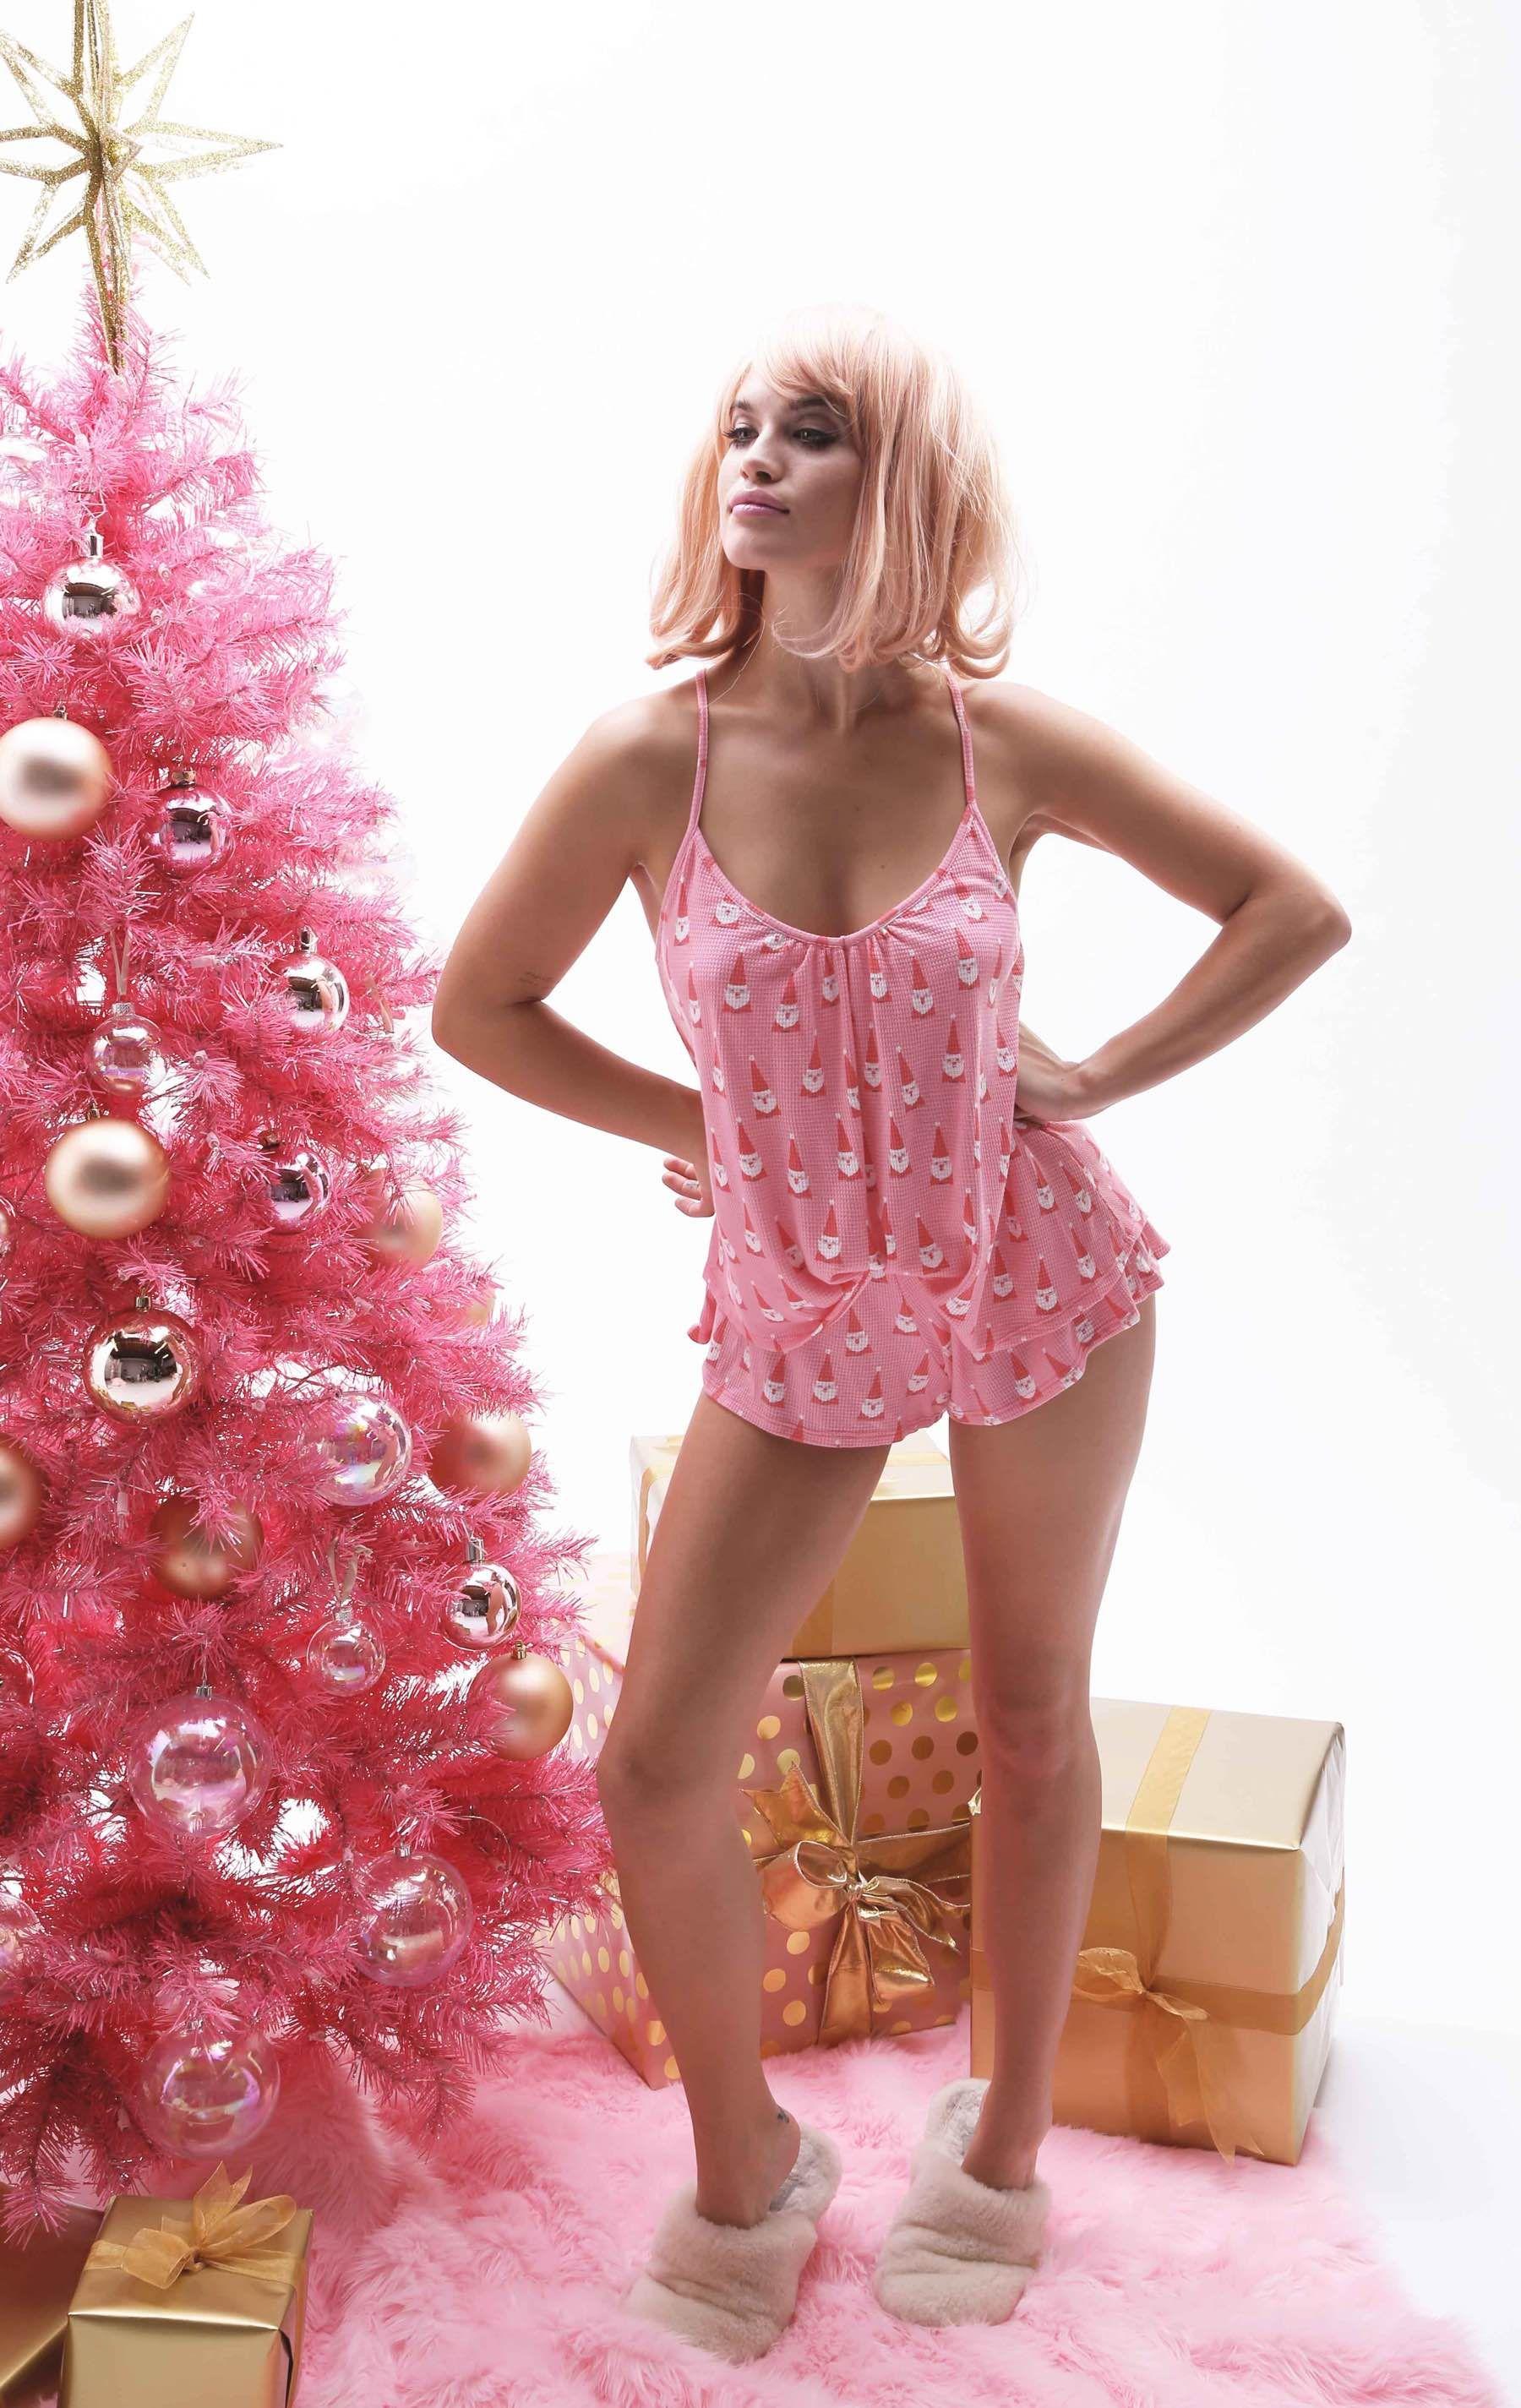 Wildfox Christmas Pajamas.Wildfox Pink Christmas Intimates Pink Christmas Pink